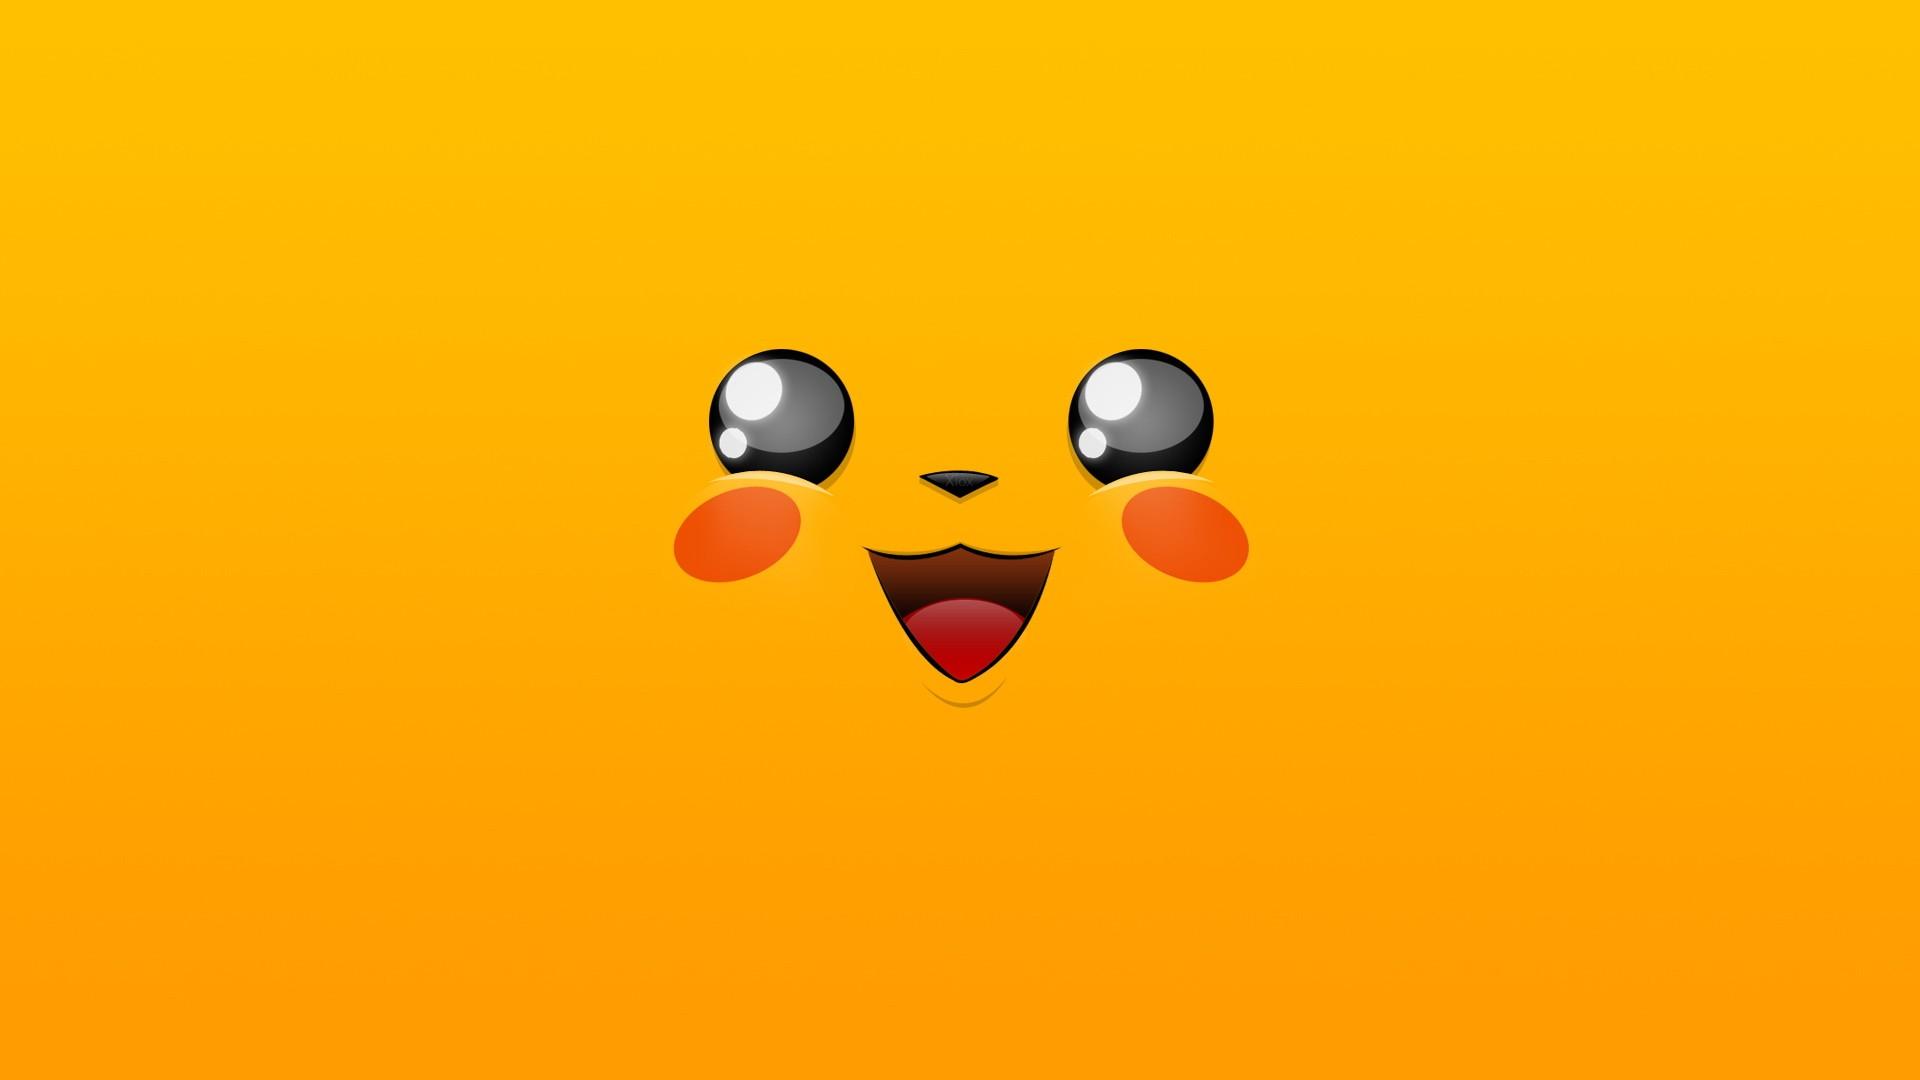 Pikachu Wallpaper Hd Download 1920x1080 Download Hd Wallpaper Wallpapertip